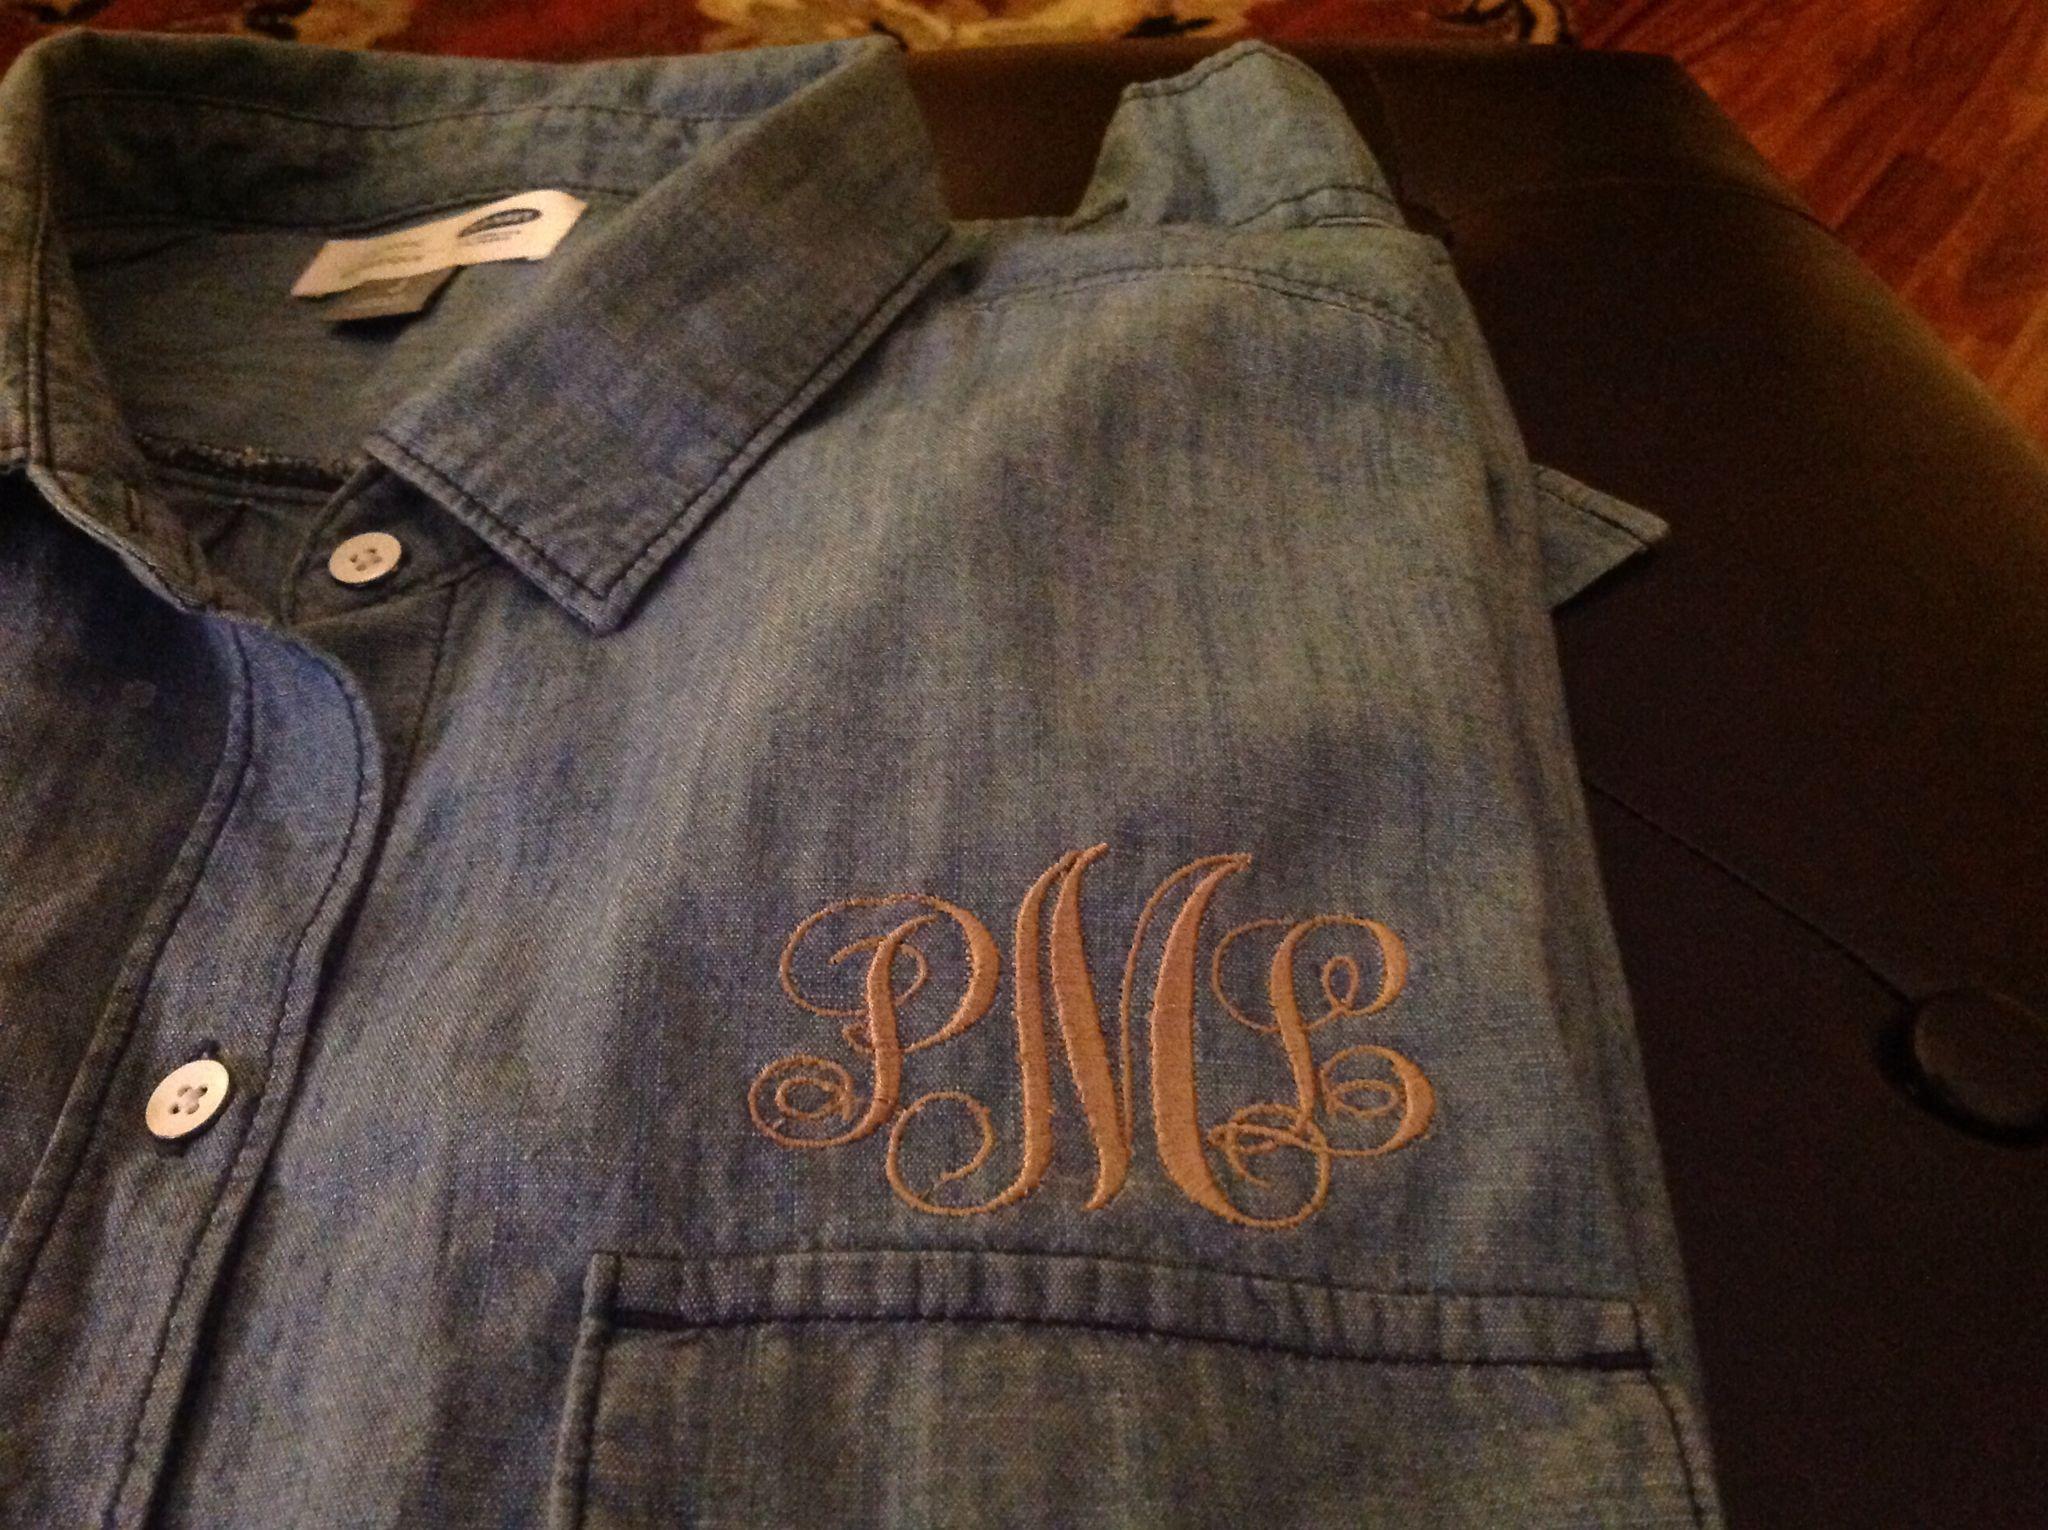 Monogrammed this denim old navy shirt!!